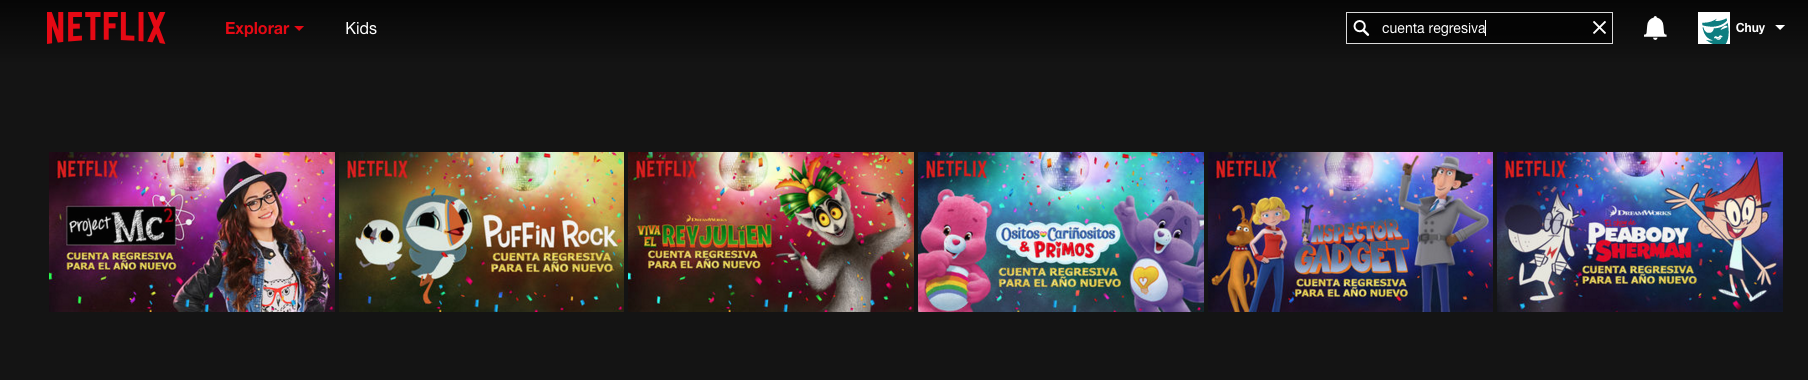 Cuenta regresiva Netflix